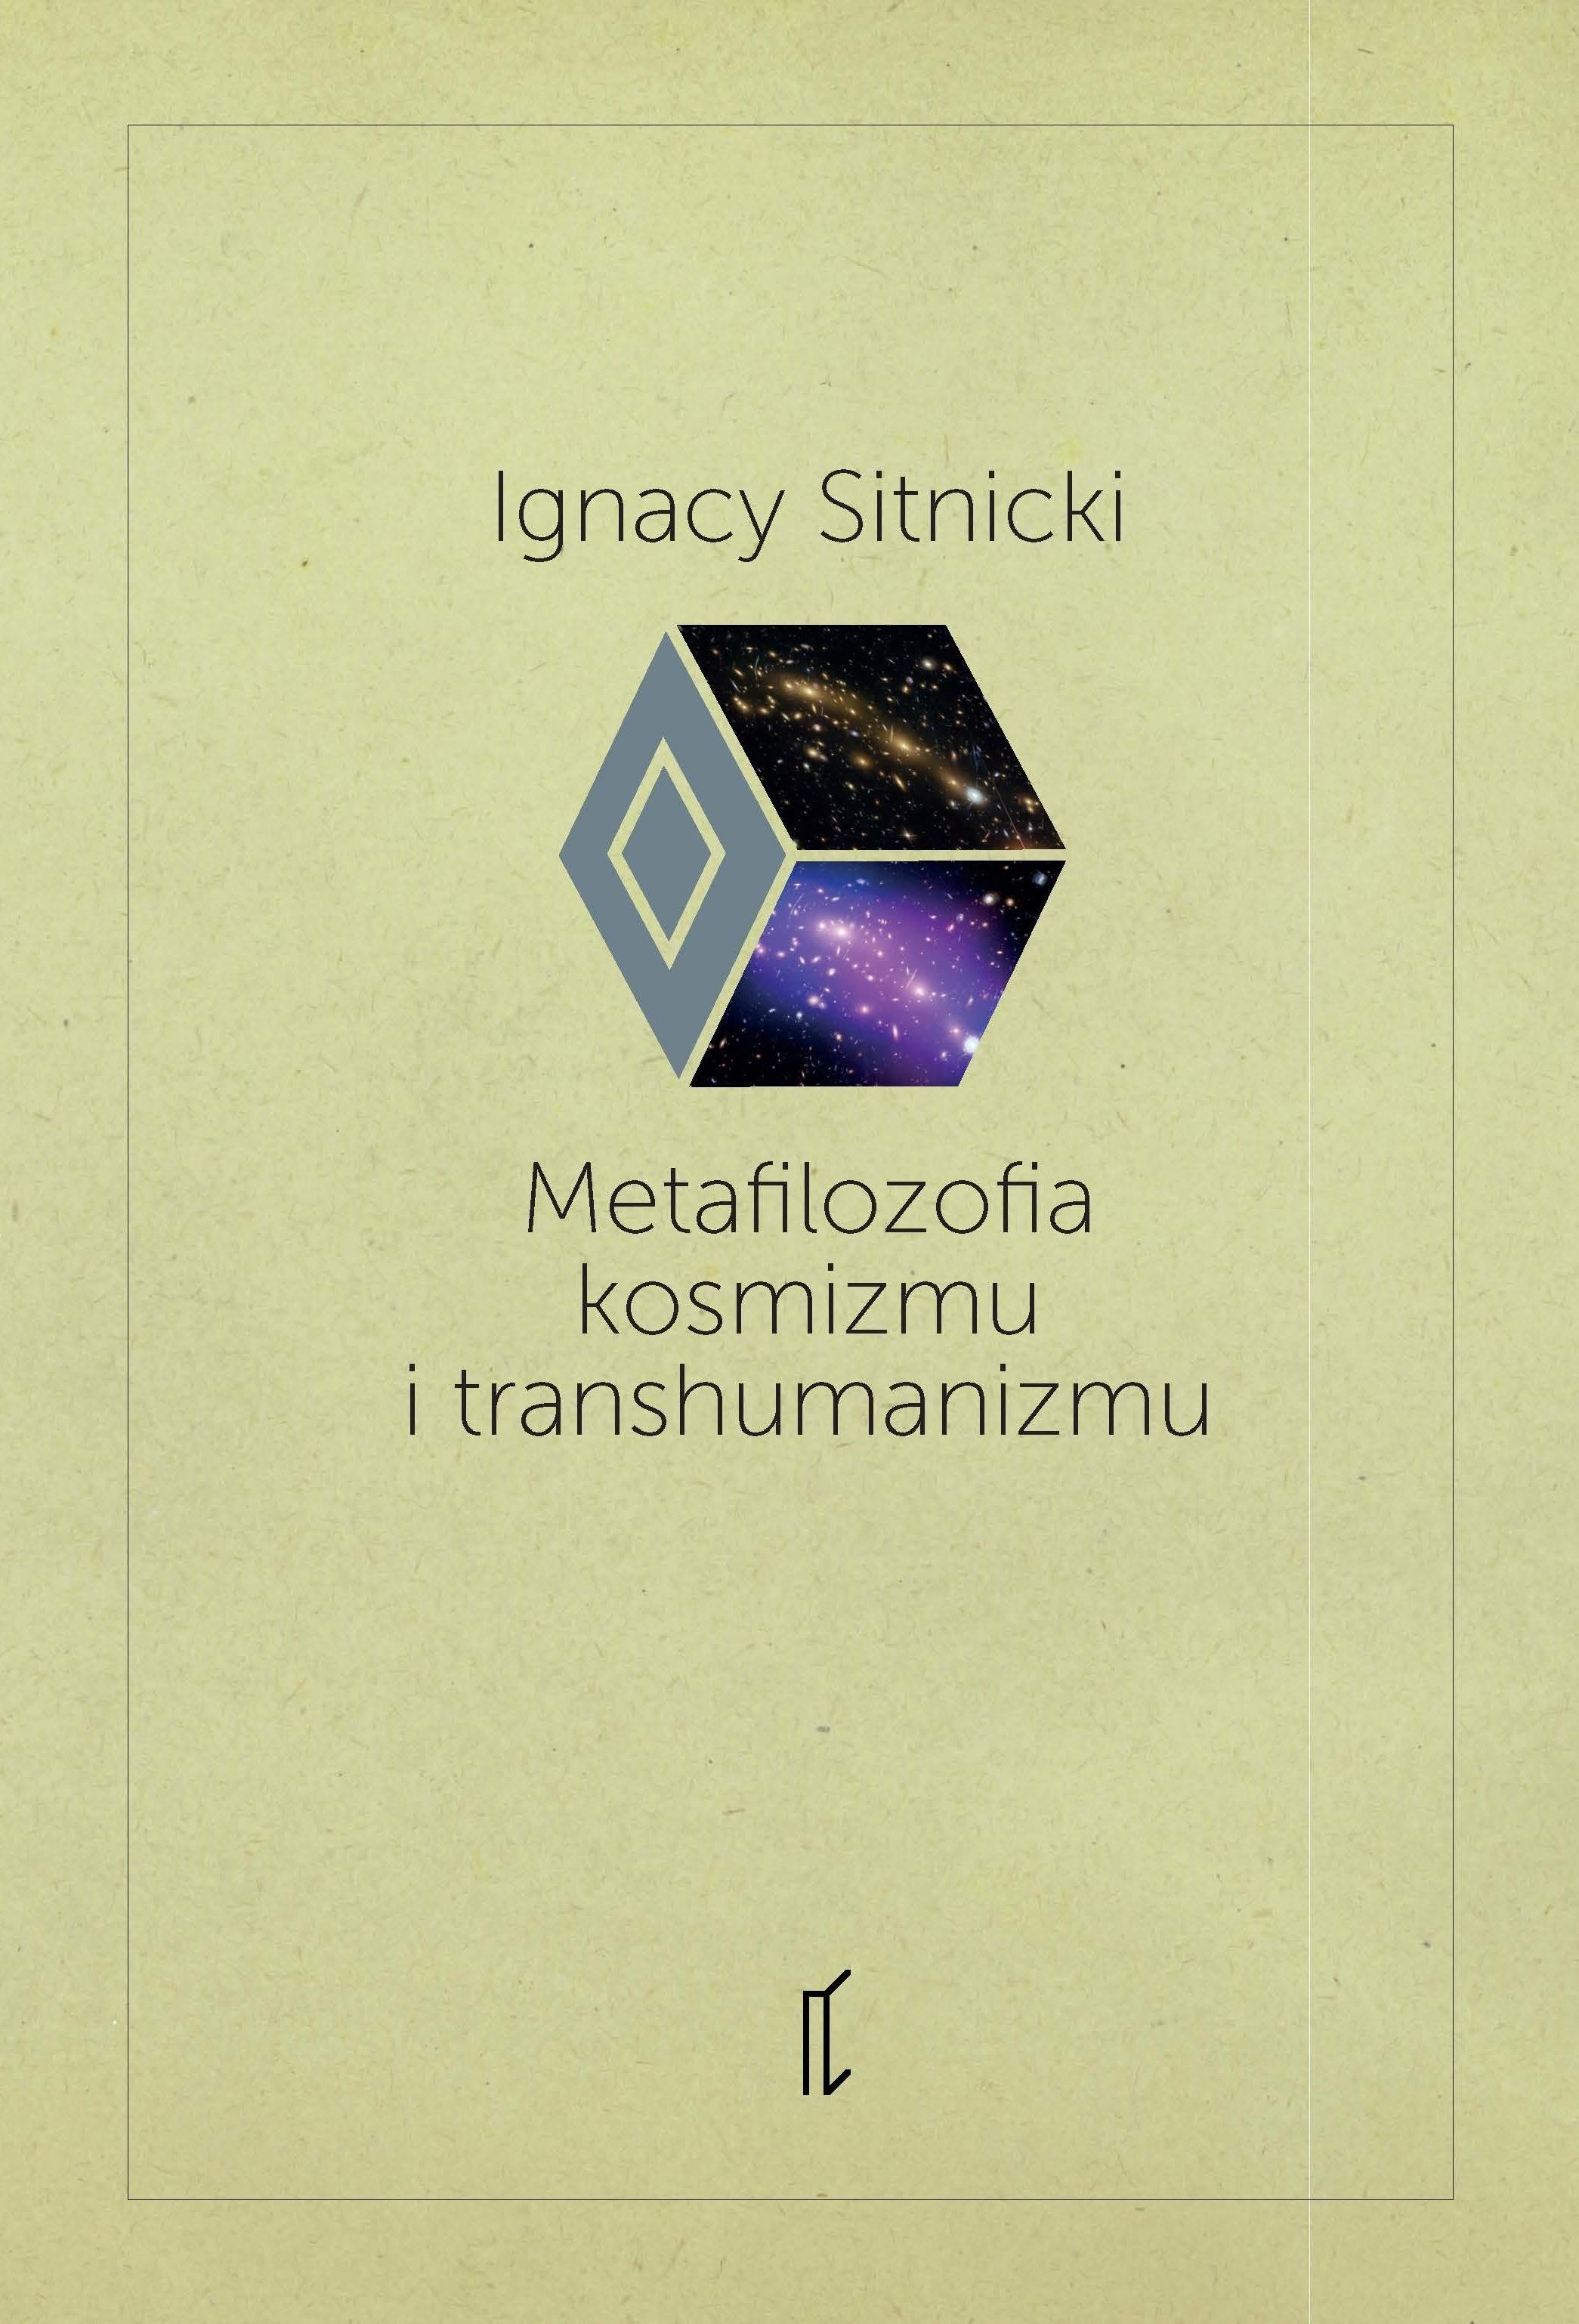 Metafilozofia kosmizmu itranshumanizmu – Ignacy Sitnicki